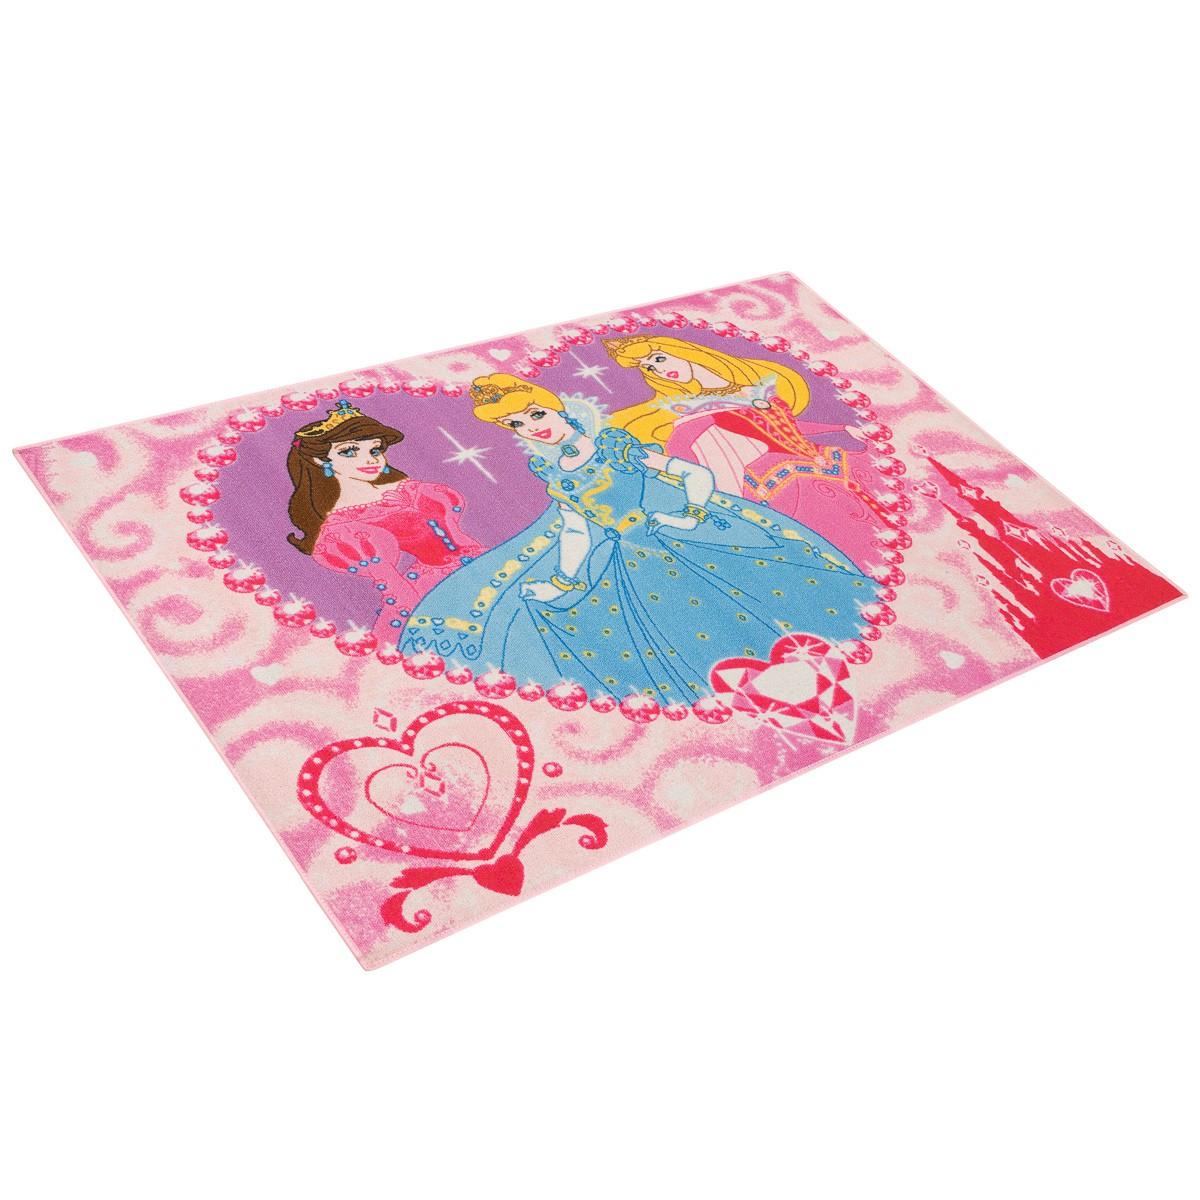 Teppich Kinderteppich Princess Jewels Teppich Prinzessin